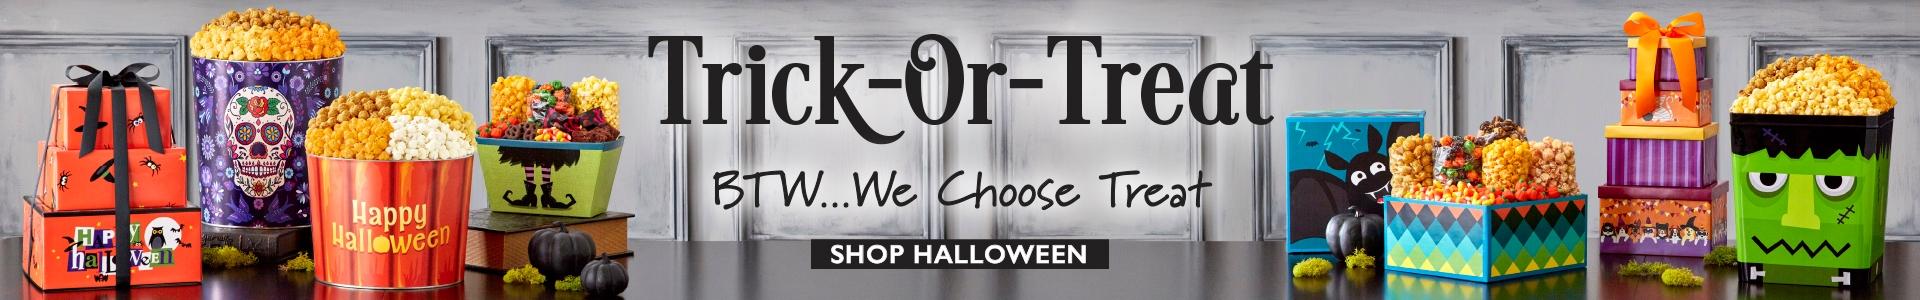 Halloween-Marquee-Banner.jpg